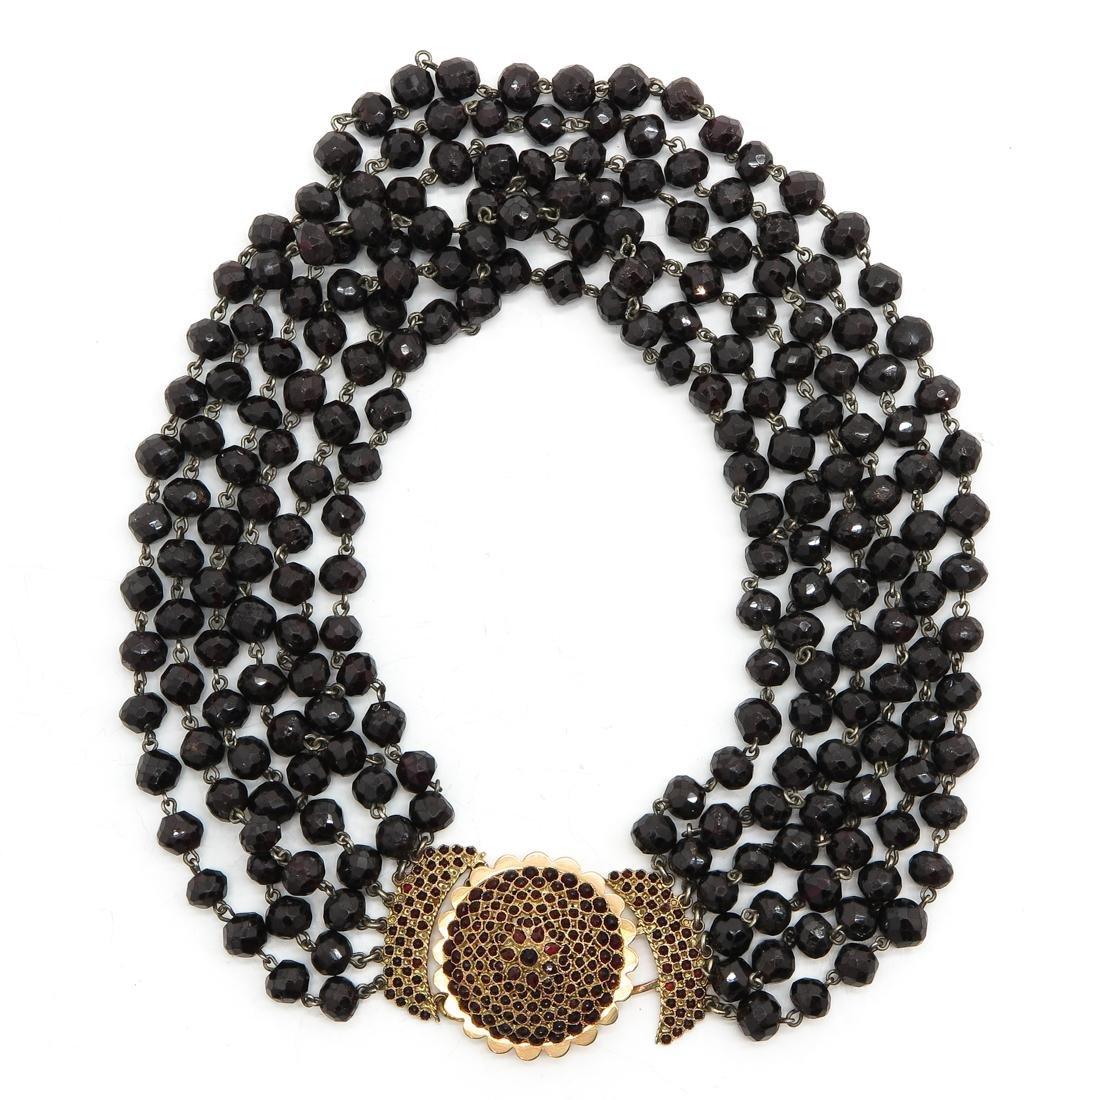 6 Strand Garnet Necklace on 14KG Clasp